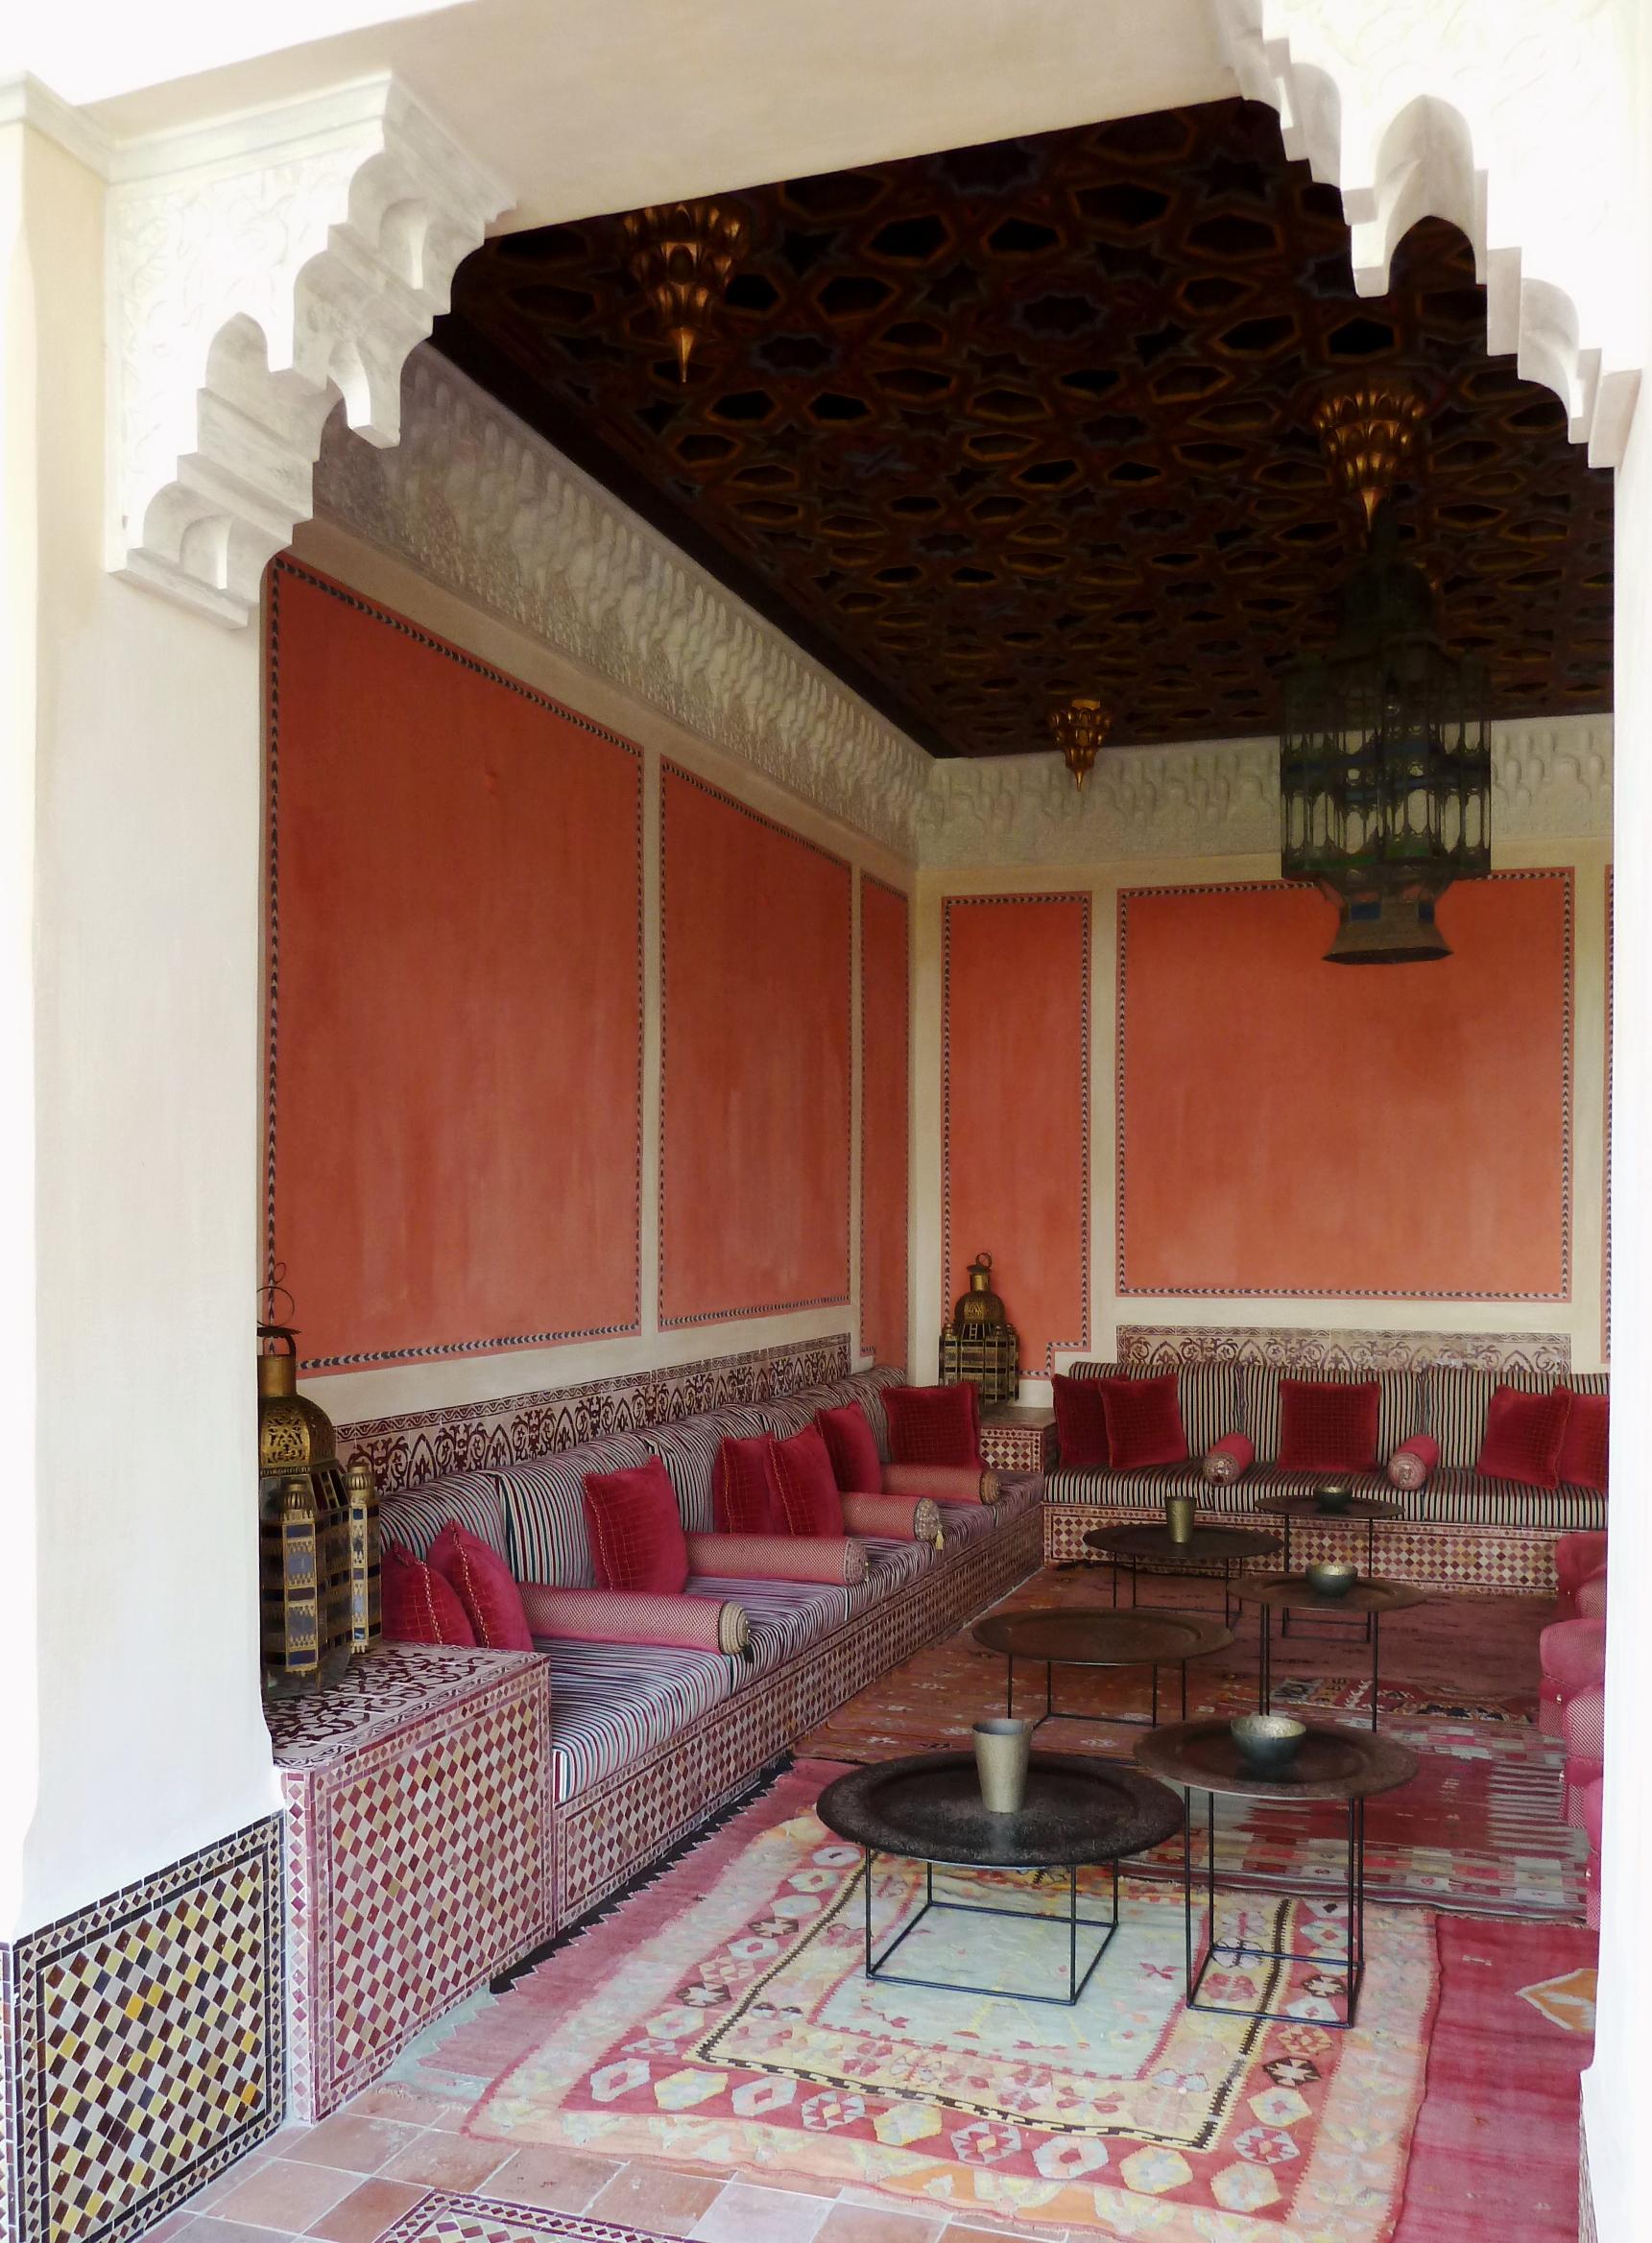 Al_Andaluz_Salon_Hotel_Finca_Cortesin_Casares_copyright_www.andrewforbes.com